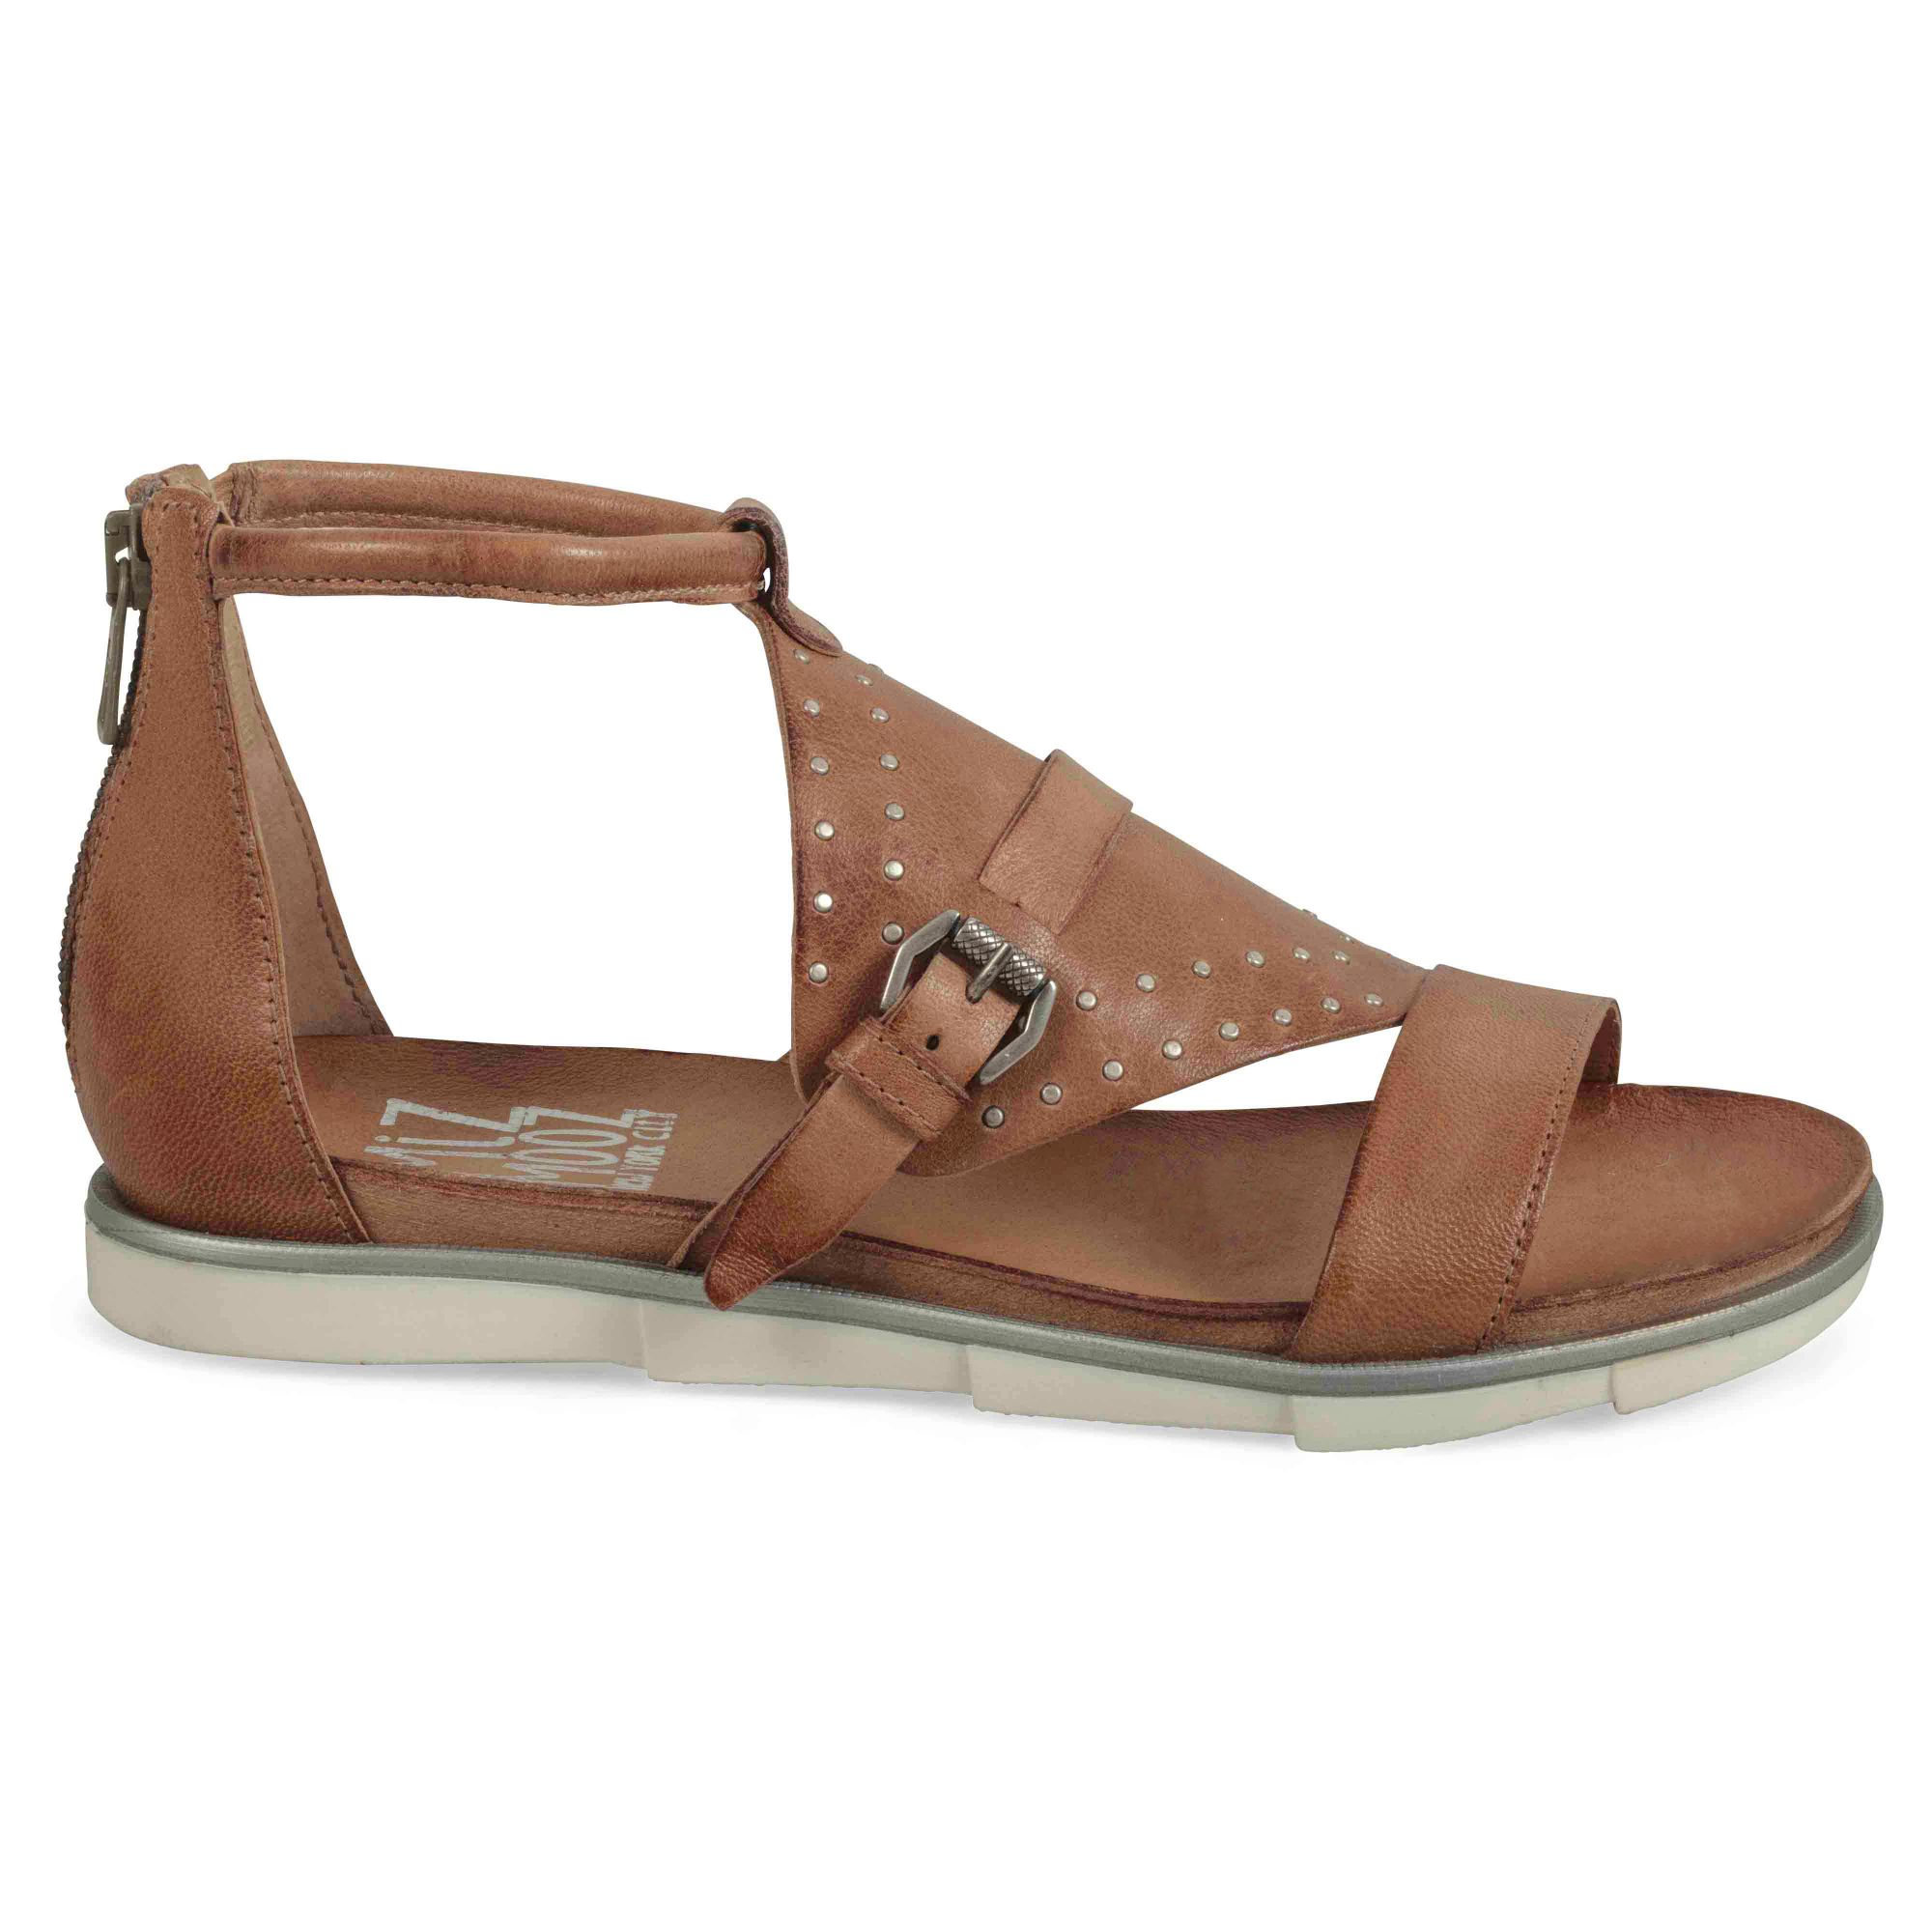 Miz Mooz Kane - Final Sale Sandals